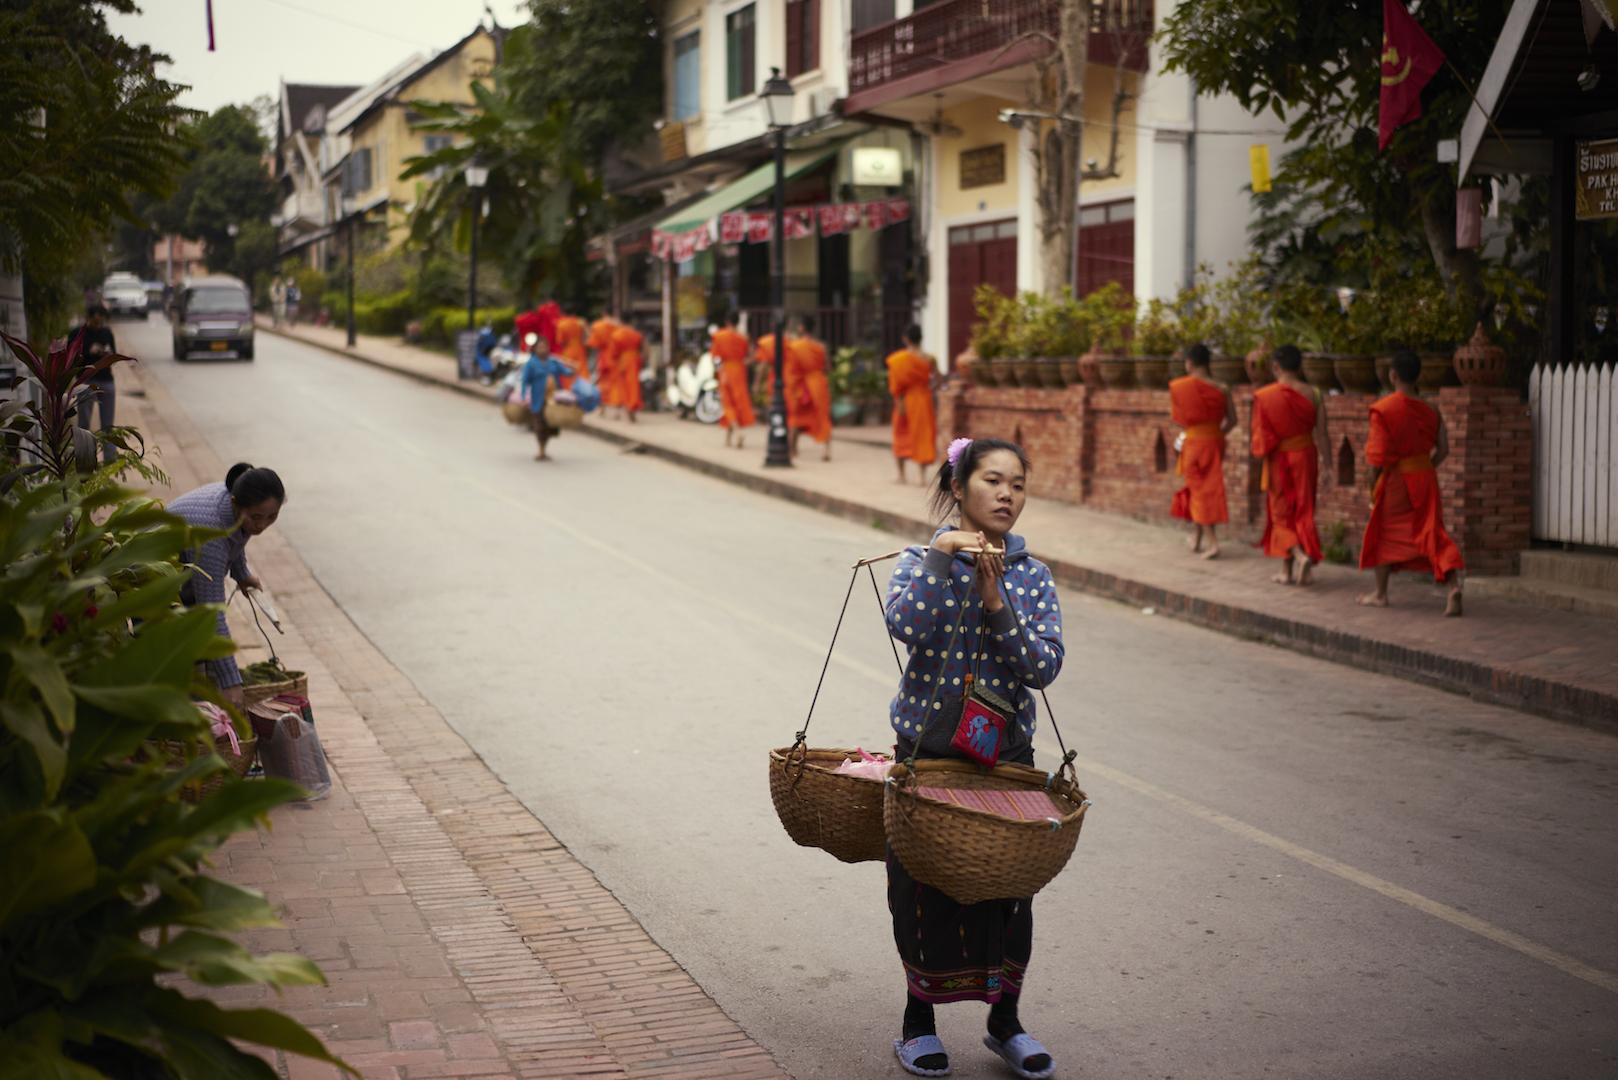 Khasar_S_Alms_V_LuangPrabang_Laos_Winter_2014.jpg.jpg